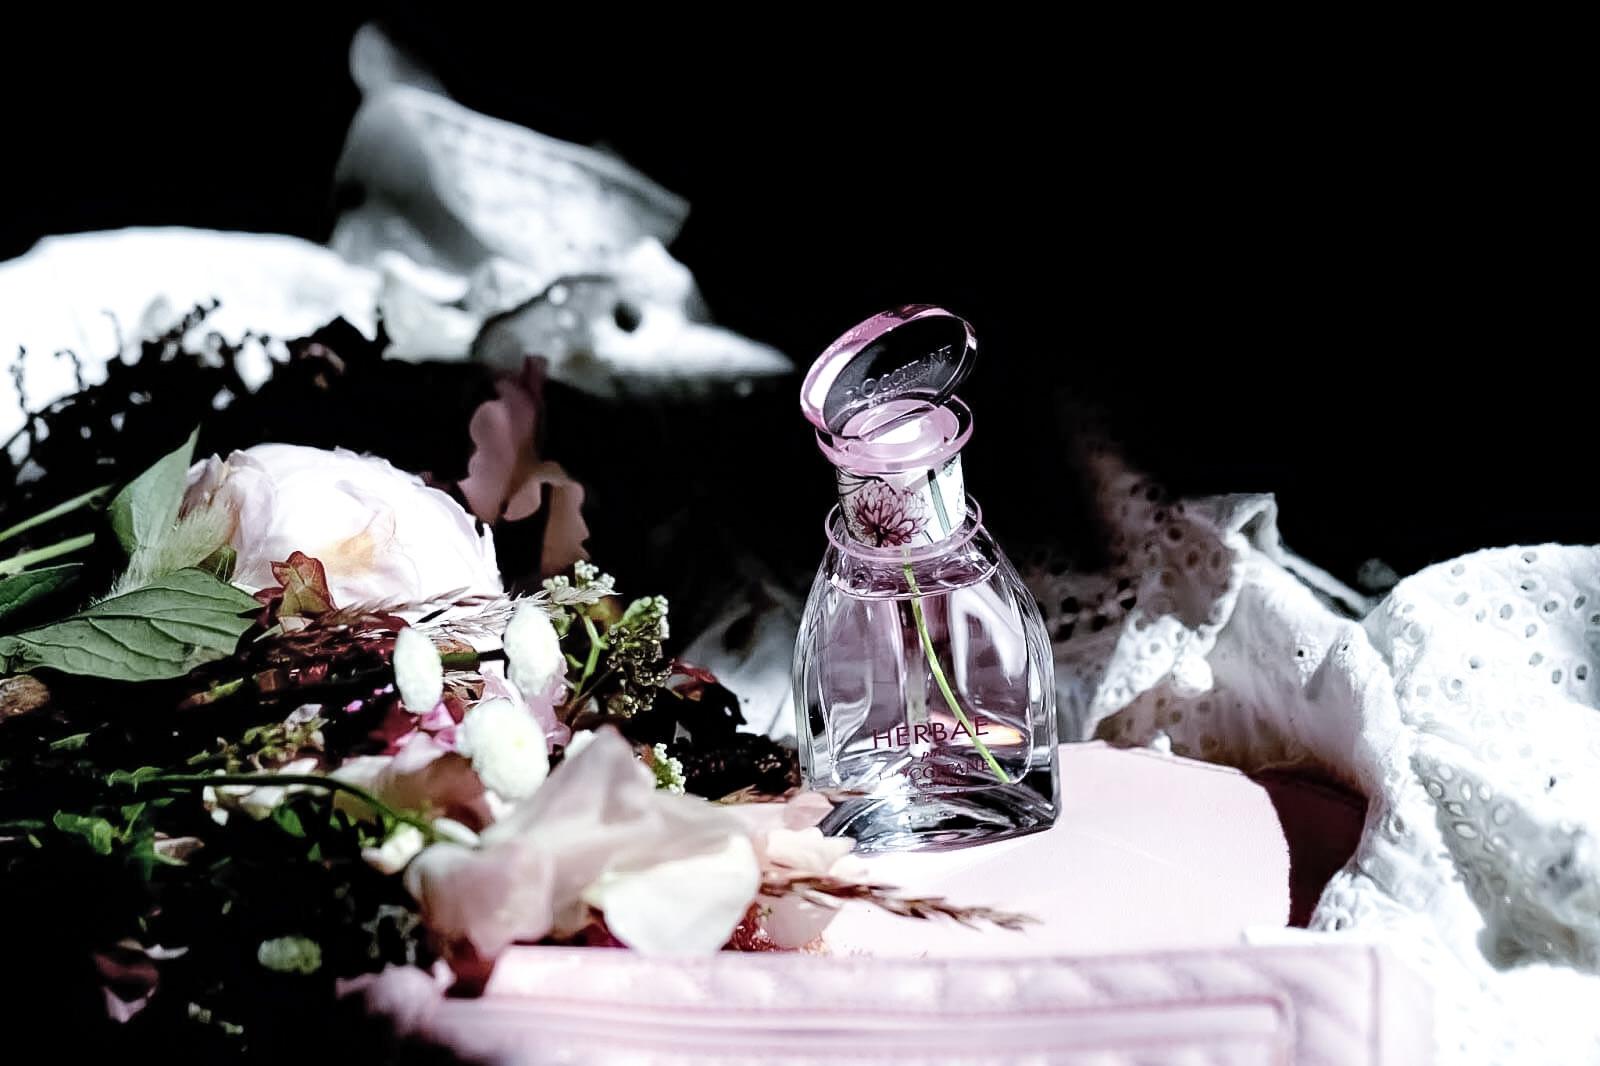 L'Occitane Herbae L'Eau parfum